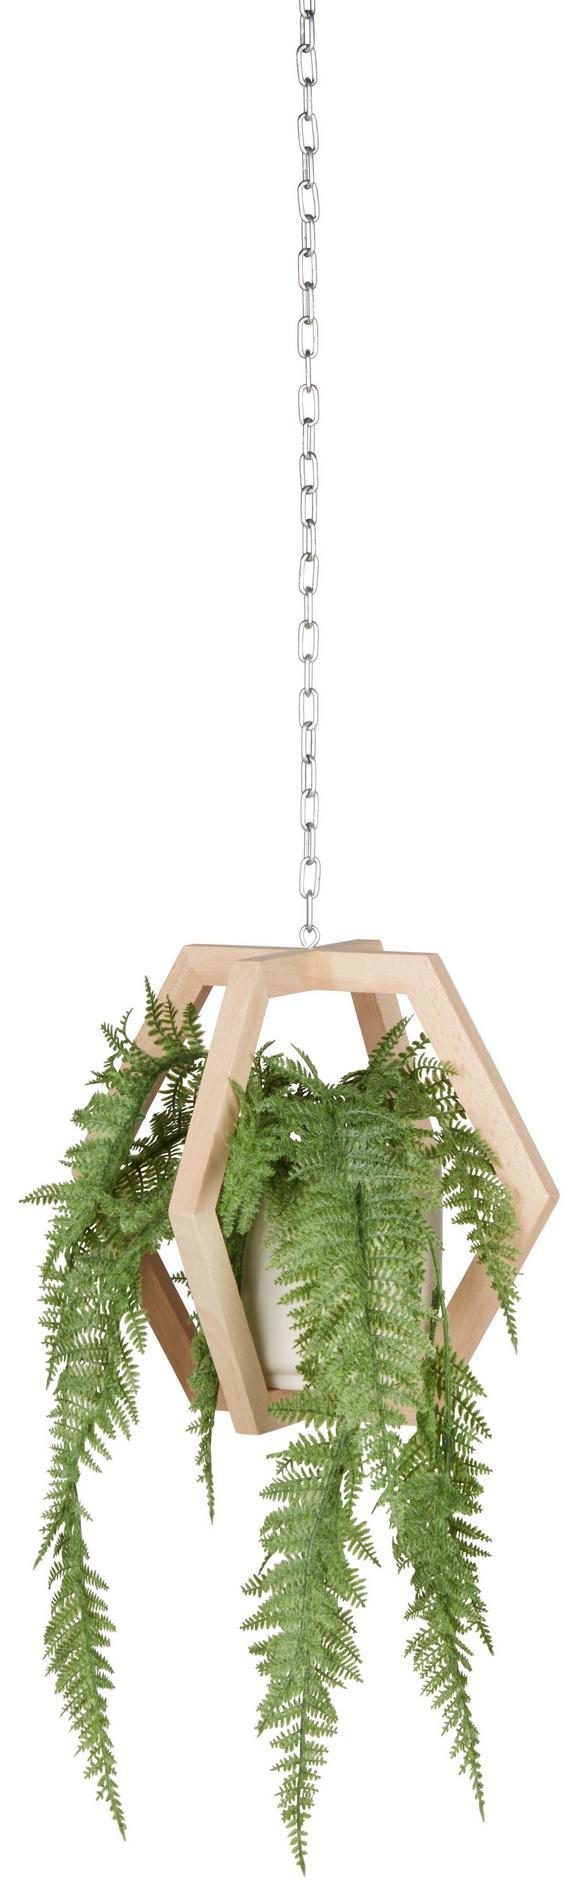 Pflanztopfhänger Felix Naturfarben - Creme/Naturfarben, Holz/Keramik (28/24,3cm) - Mömax modern living